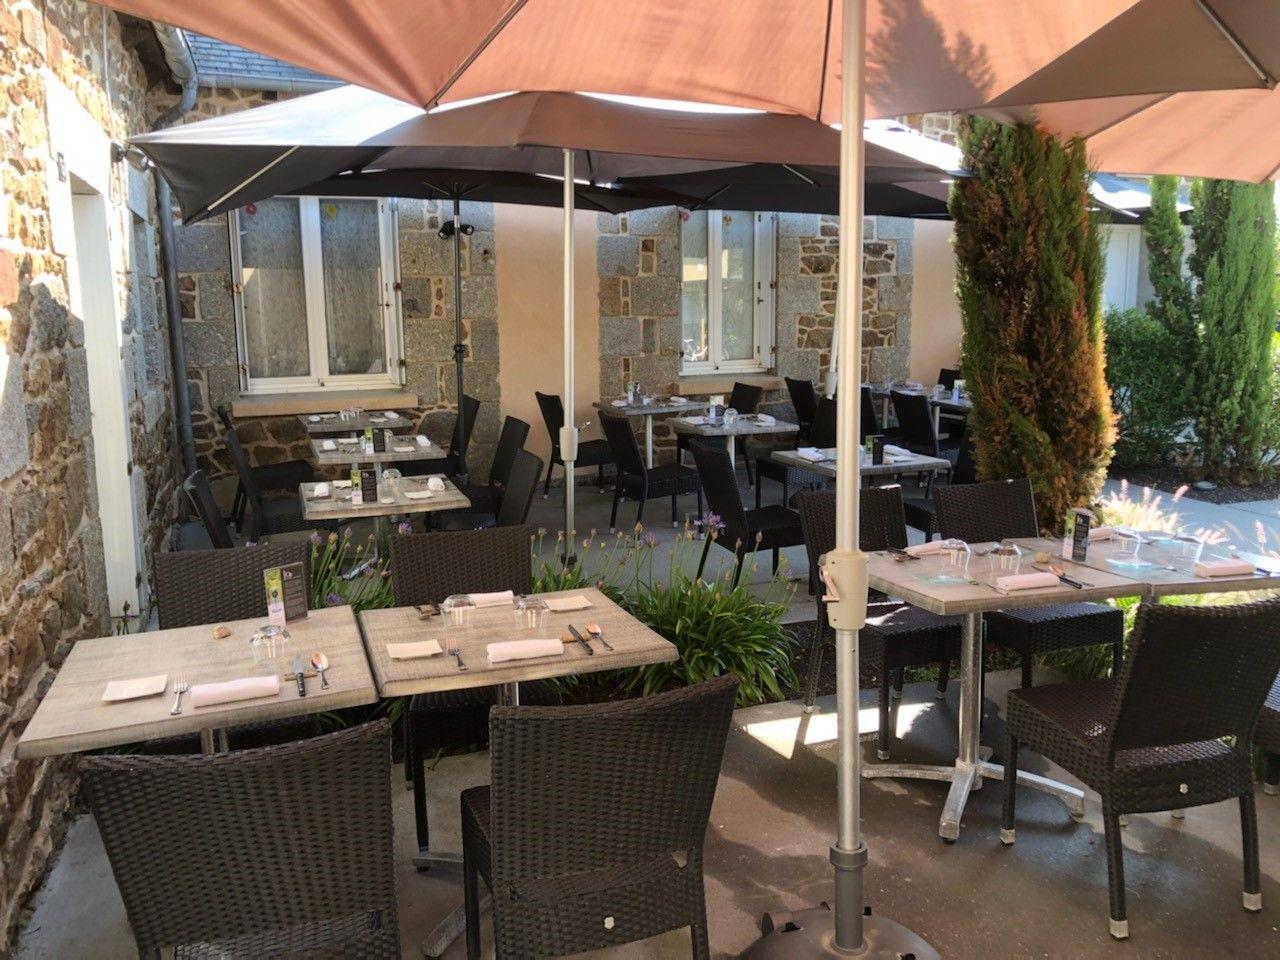 restaurant_le_brezoune_ploufragan_terrasse_parasol